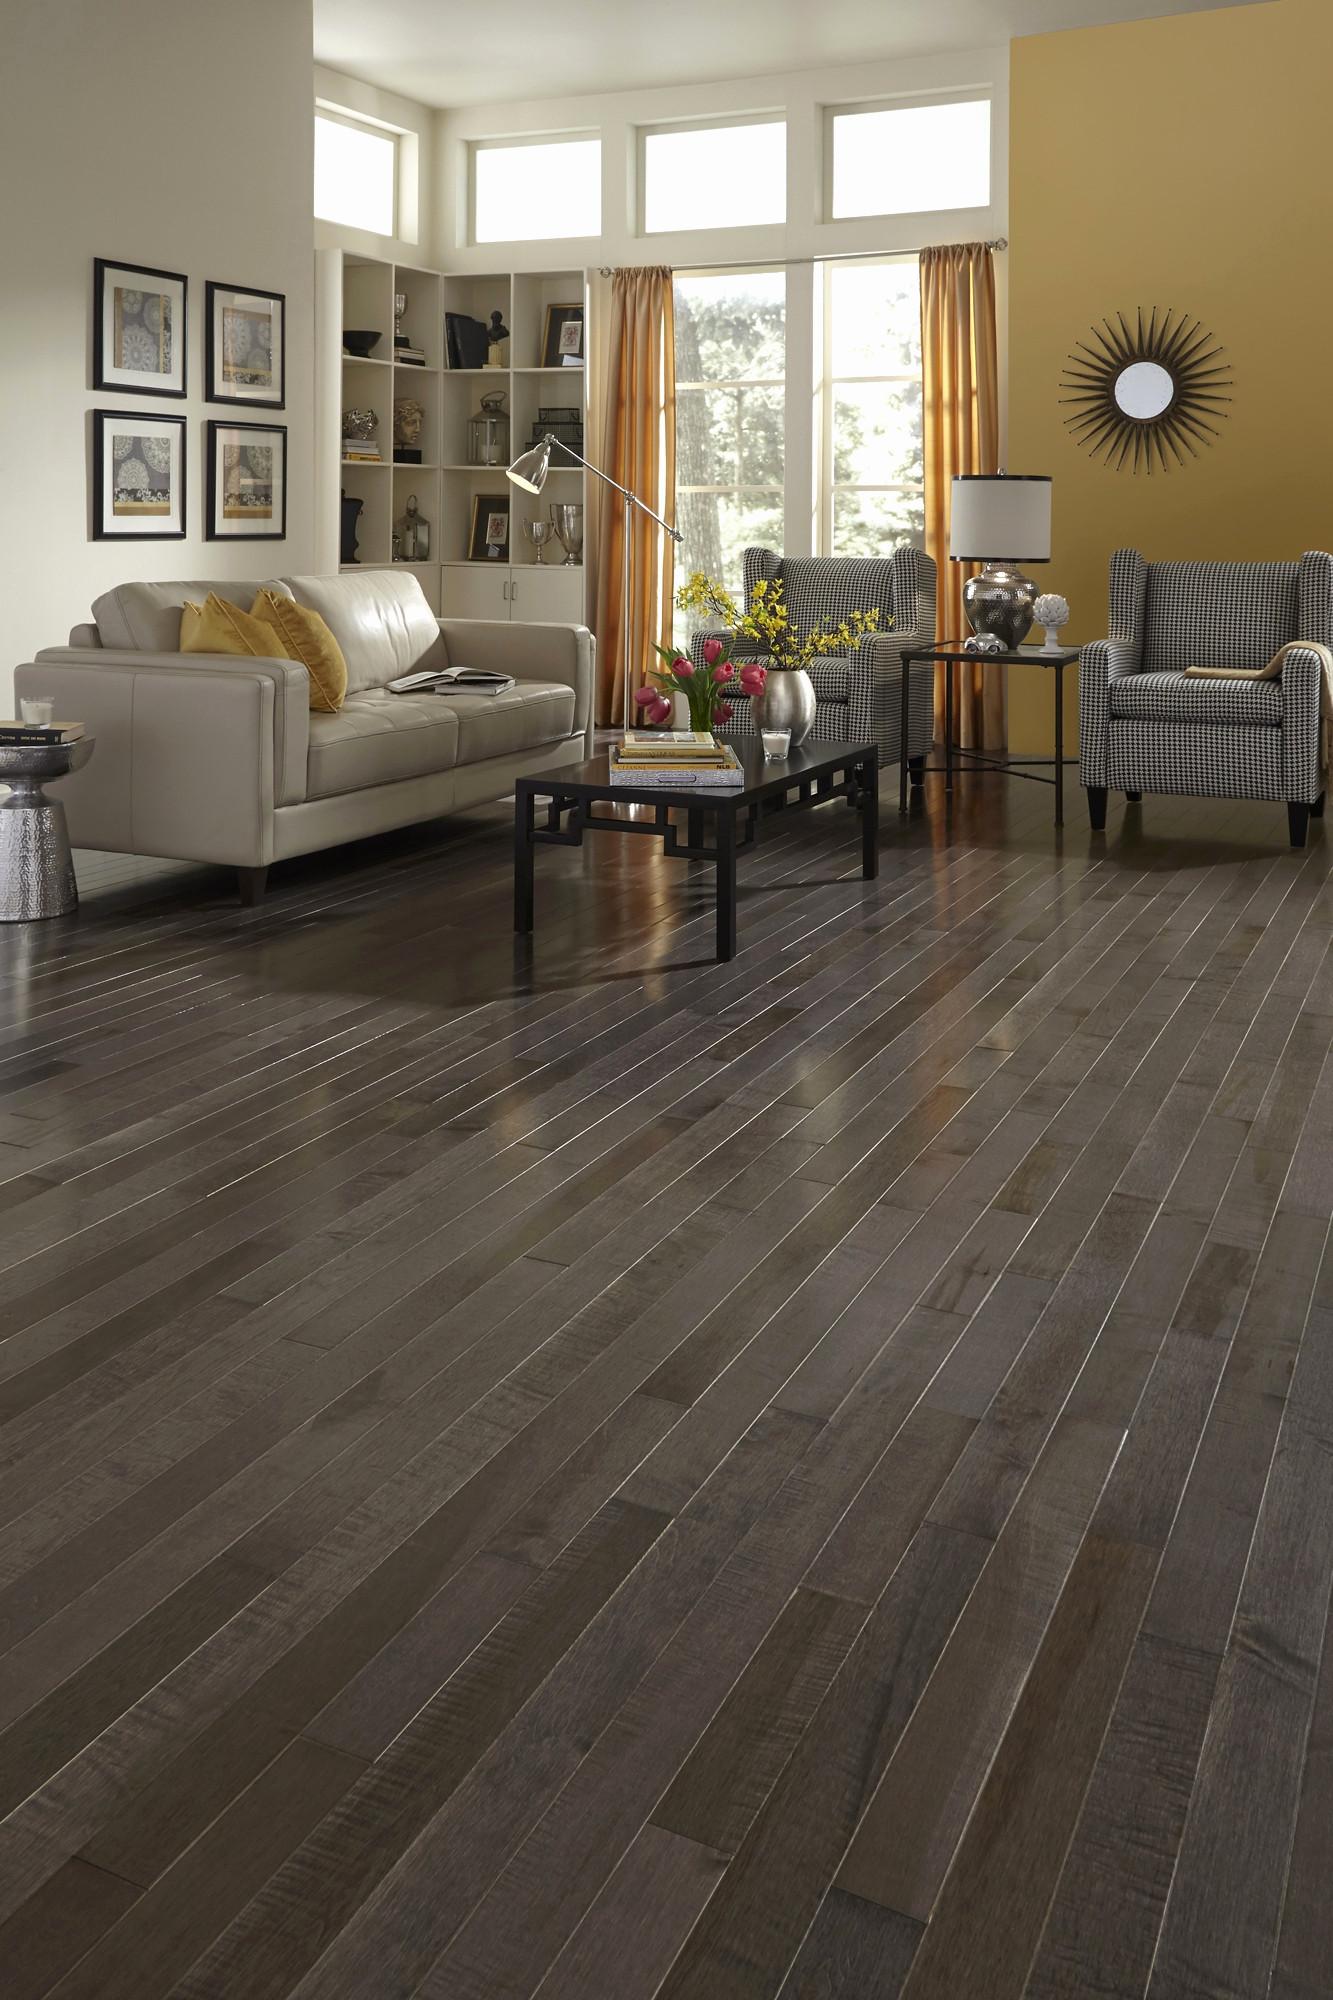 the hardwood flooring company reno of laminated wooden flooring prices floor plan ideas inside laminated wooden flooring prices best floor modern casa laminate flooring floor reno direct floors